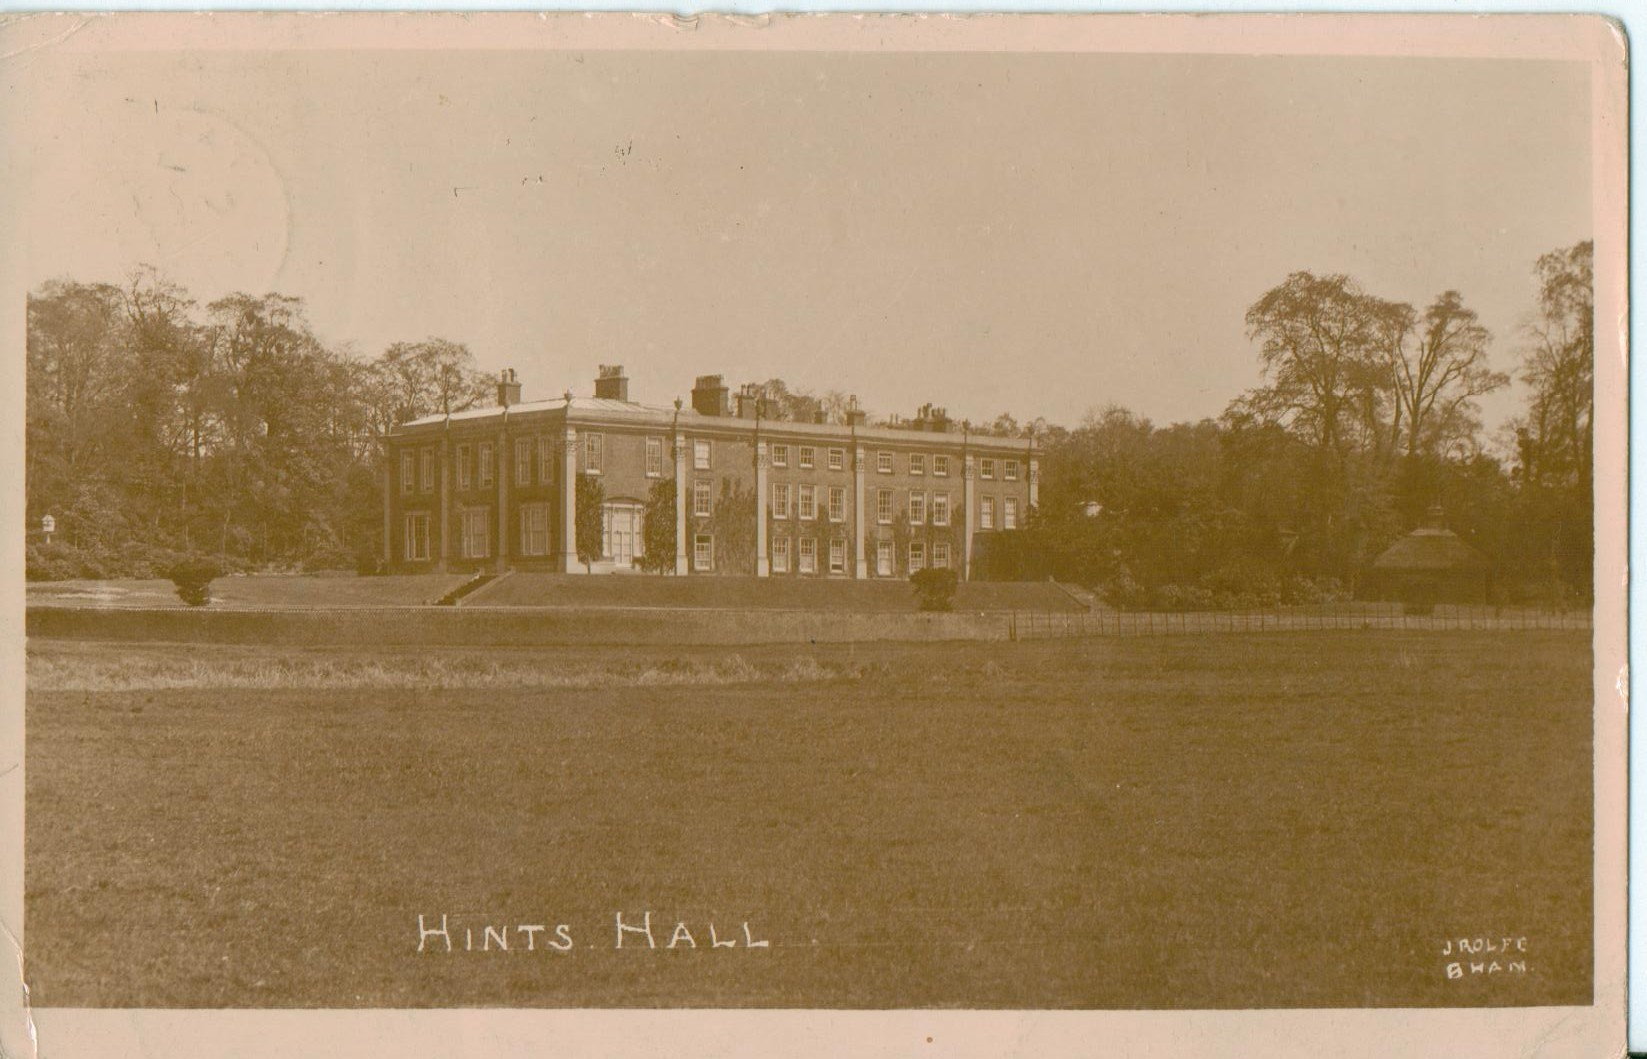 Hints Hall